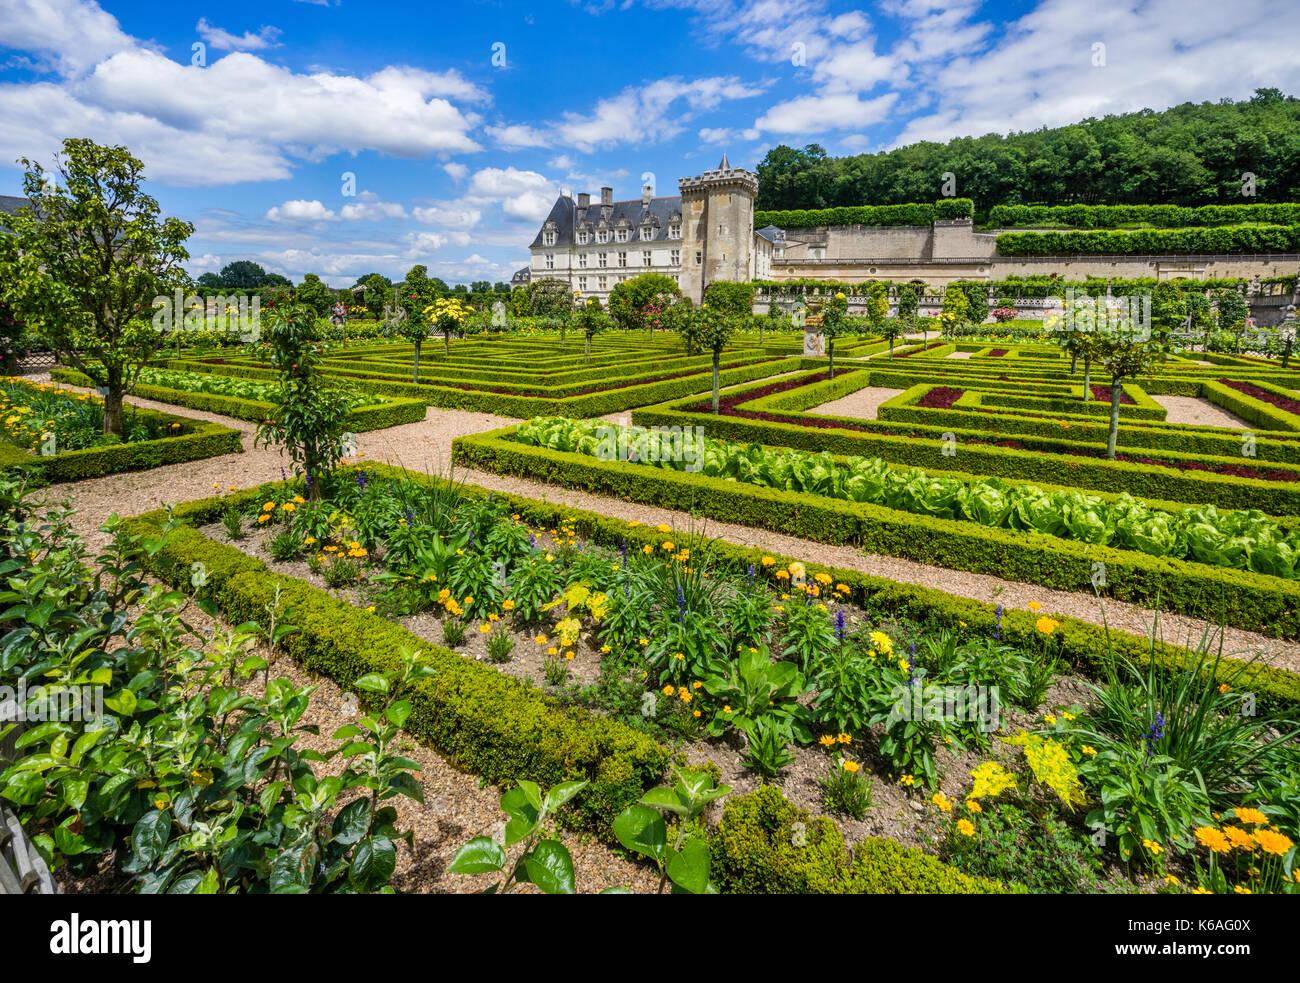 France, Indre-et-Loire department, Château de Villandry, ornamental vegetable growing in the Kitchen Garden - Stock Image